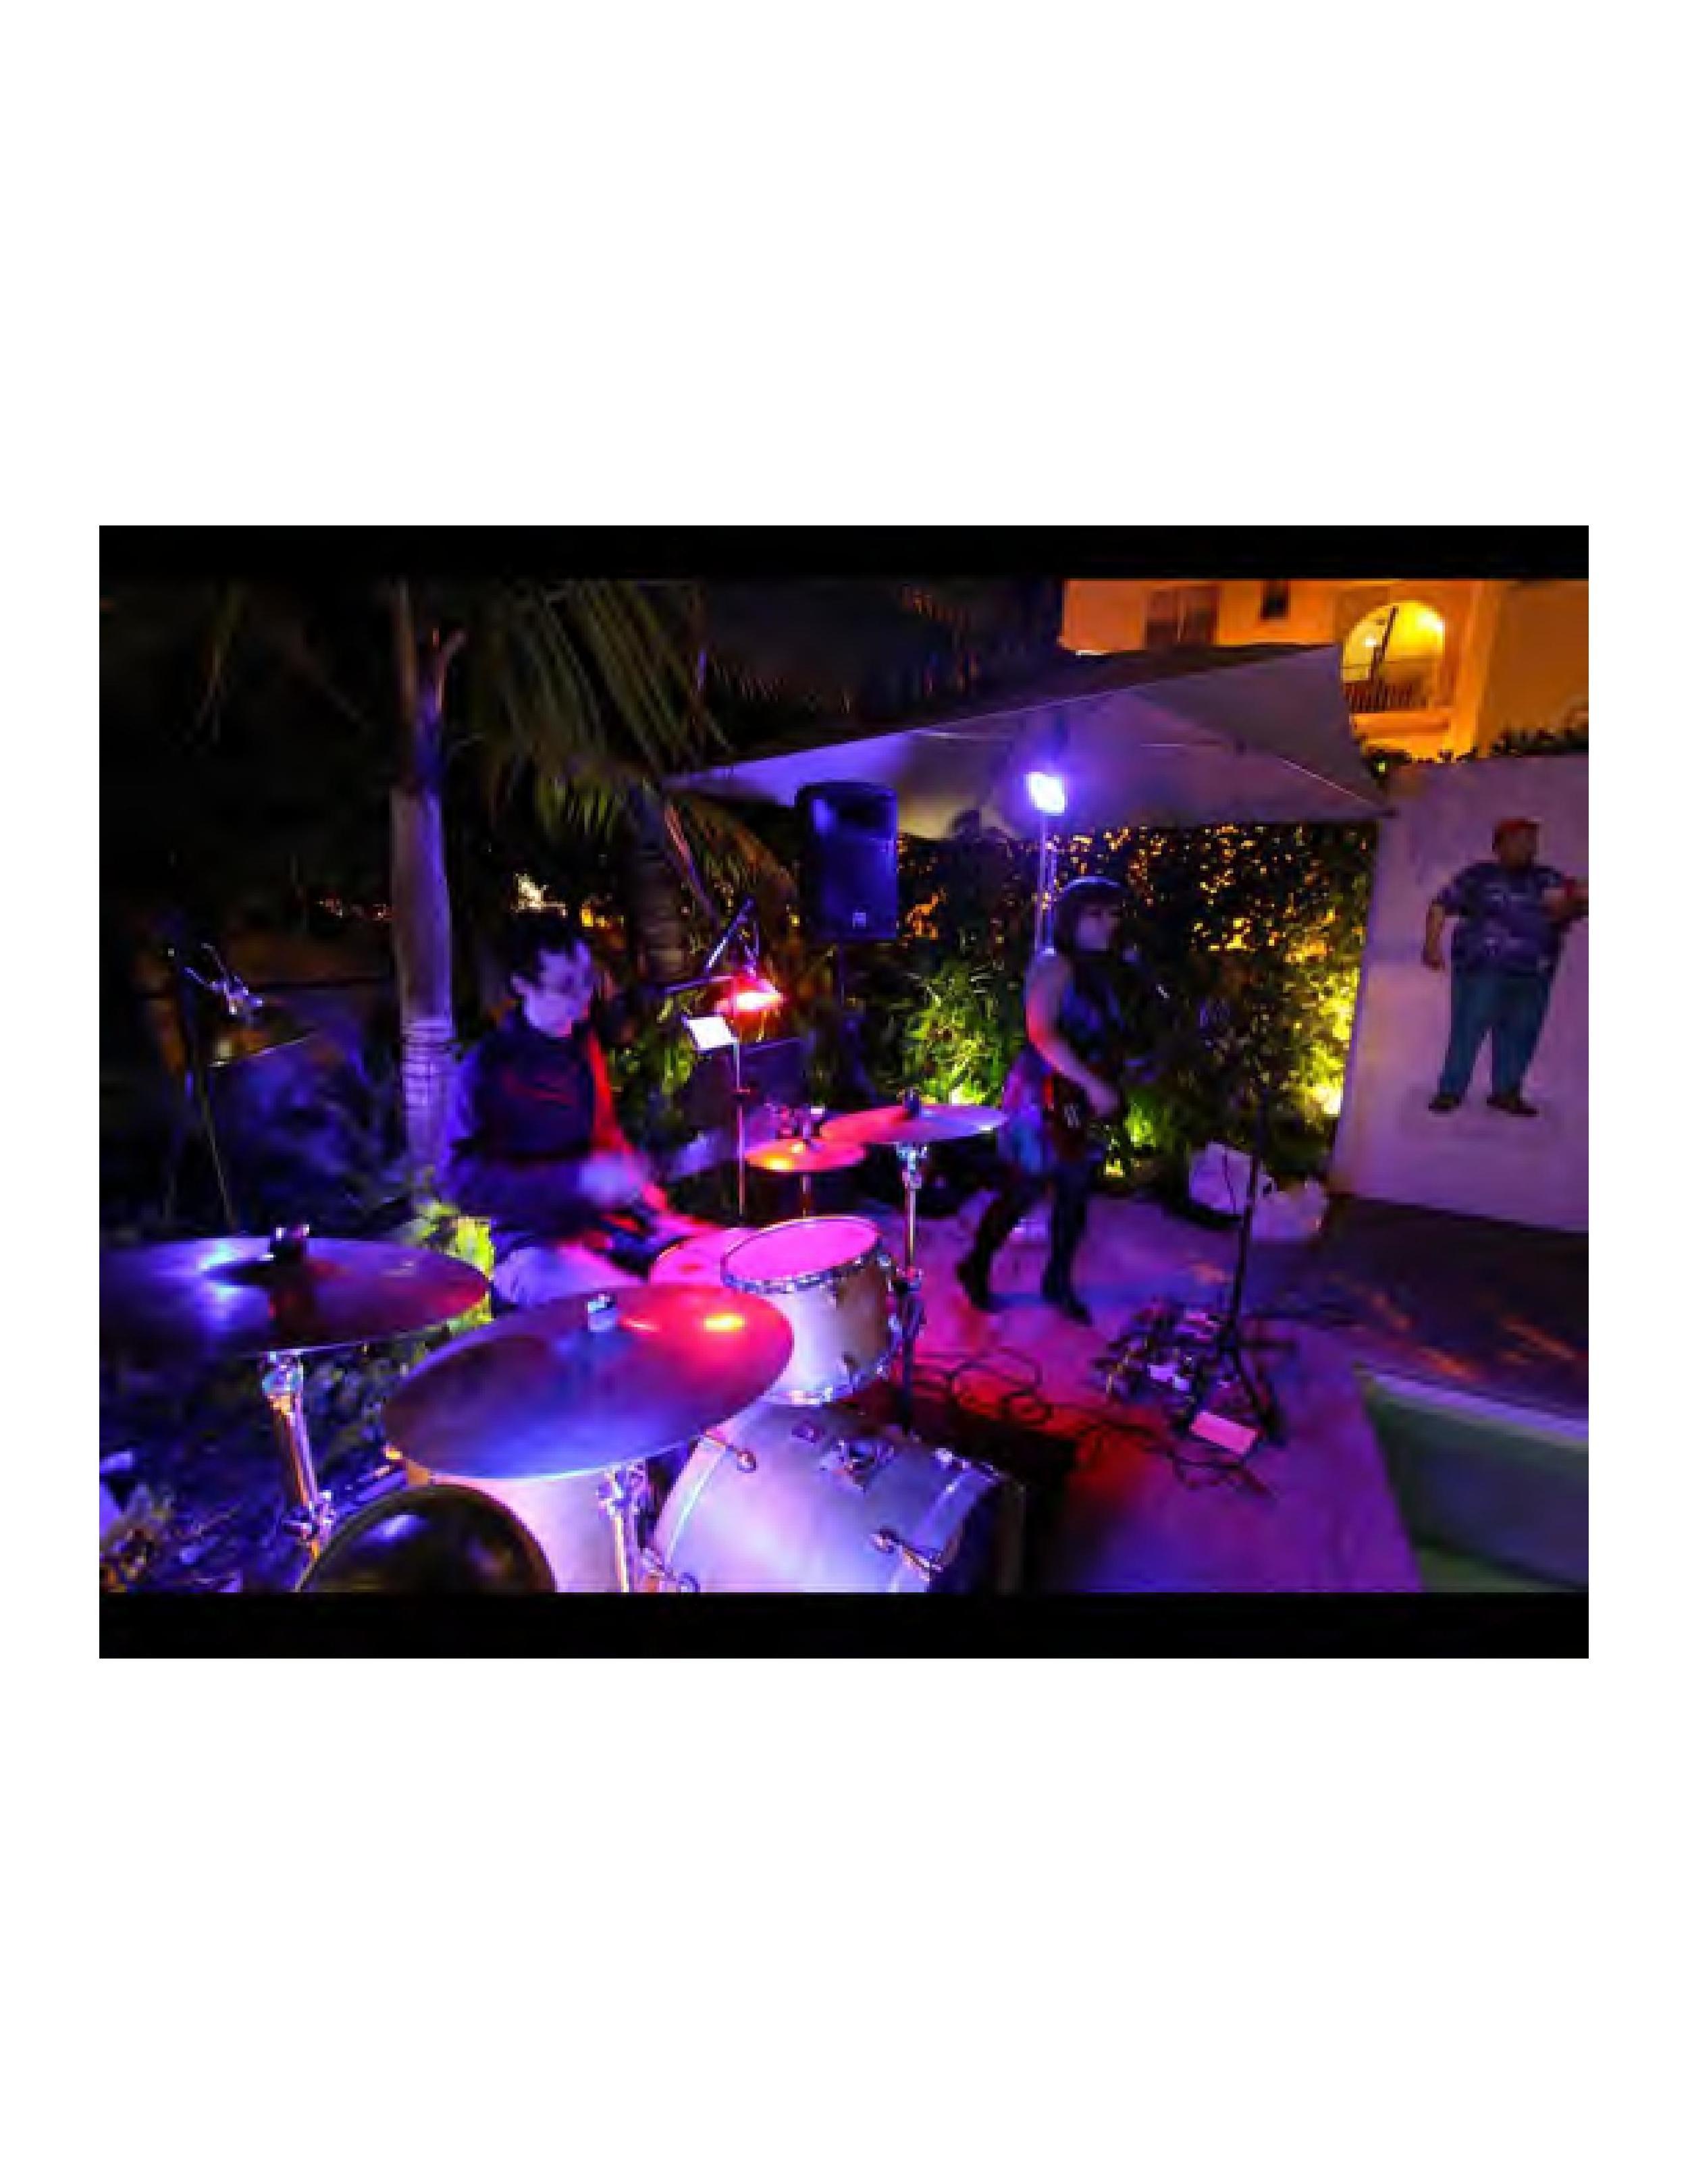 Miami_Art_Basel_Photographs-web-page-073.jpg